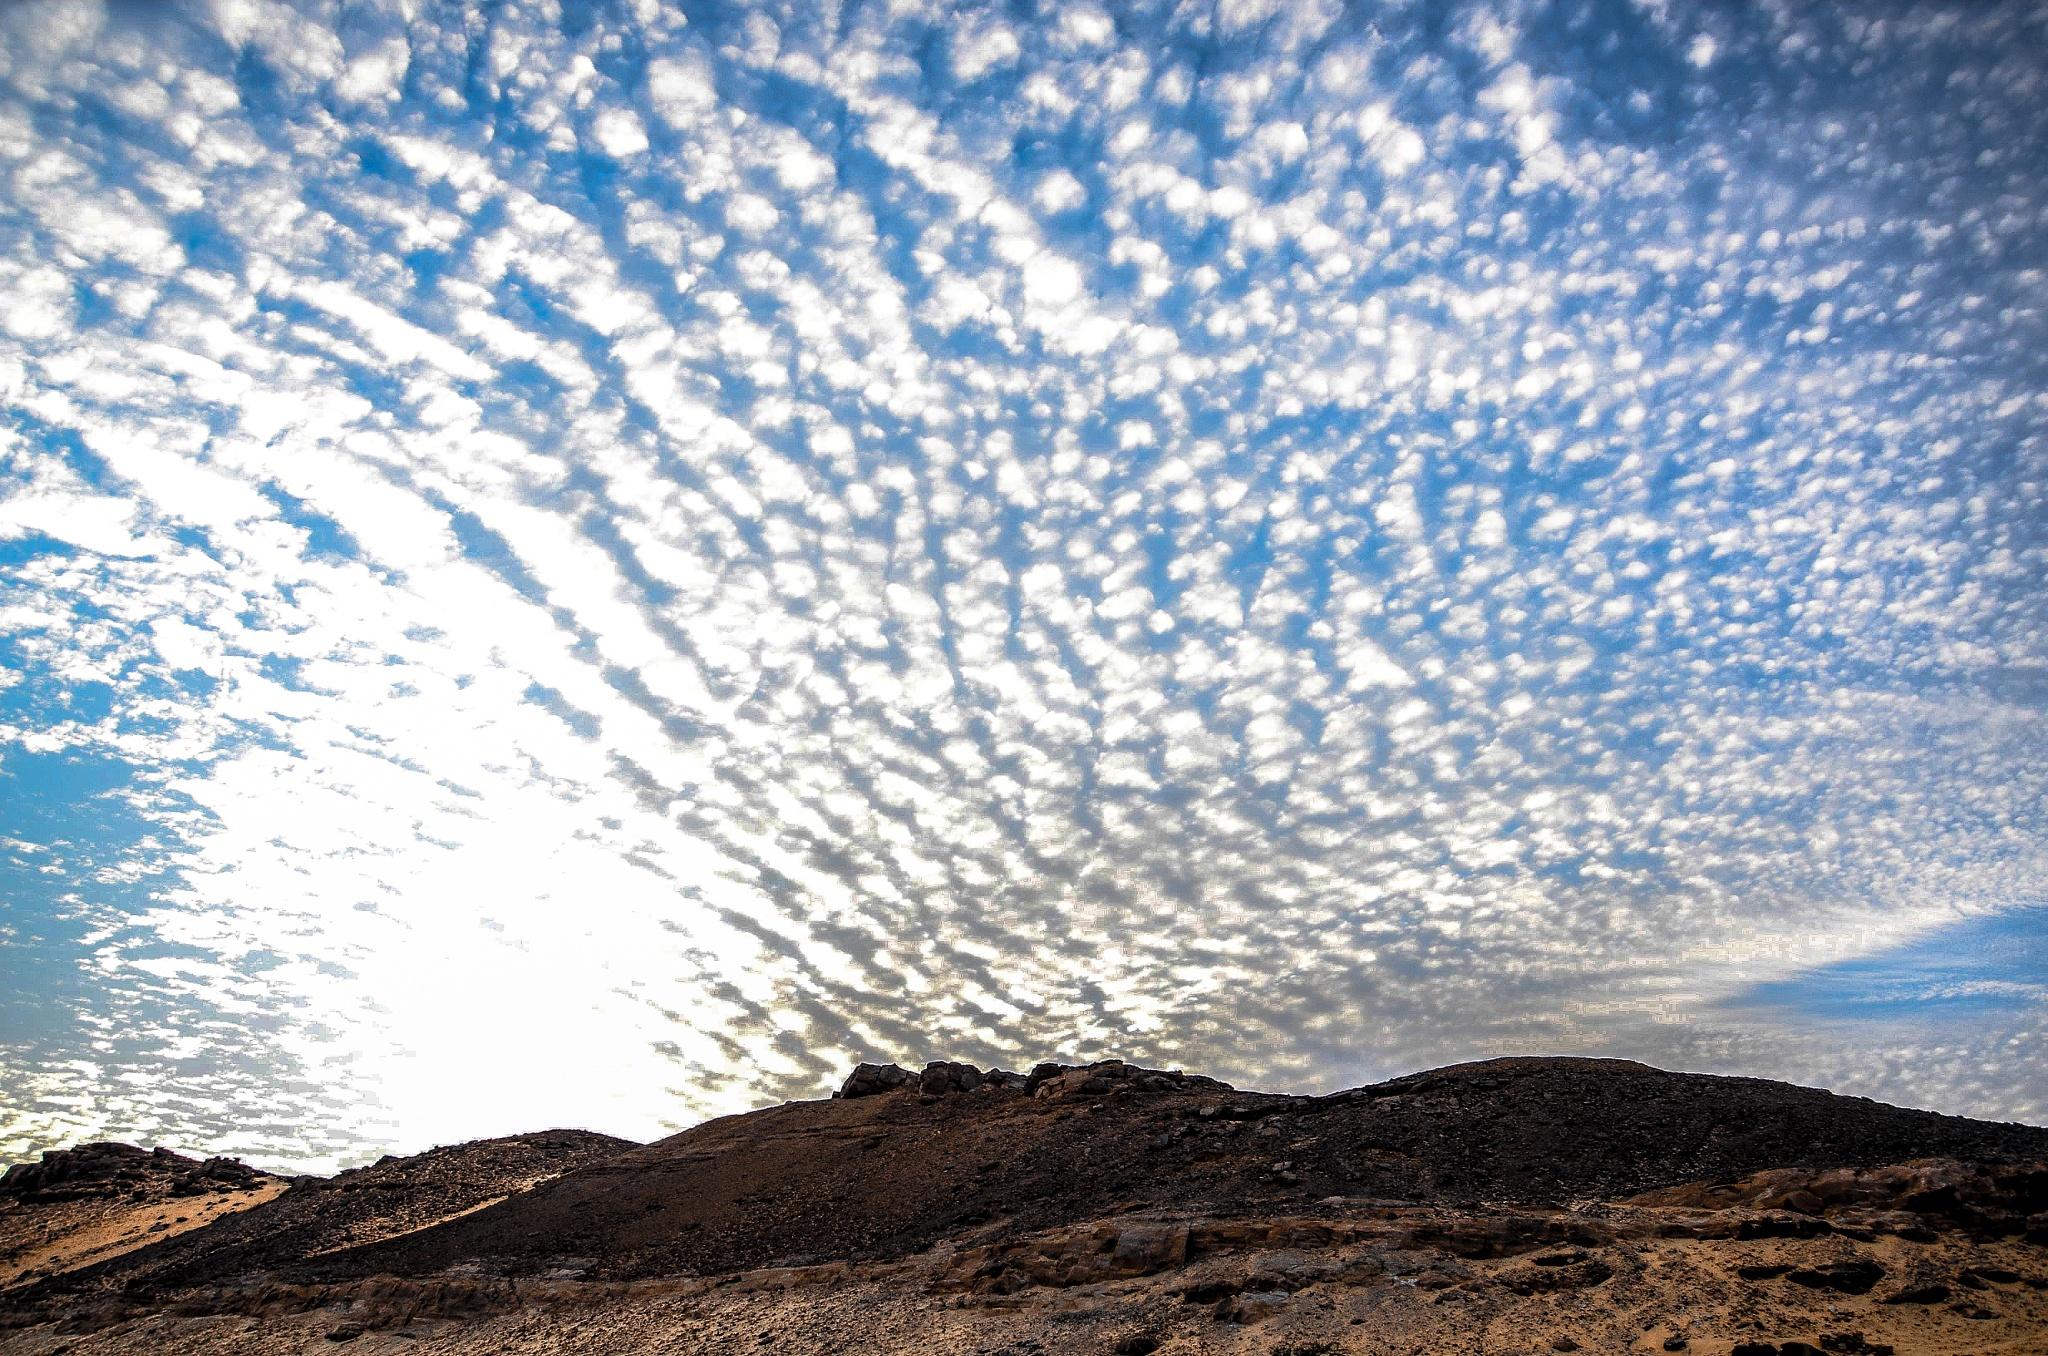 aswan_egypt by engy_samy